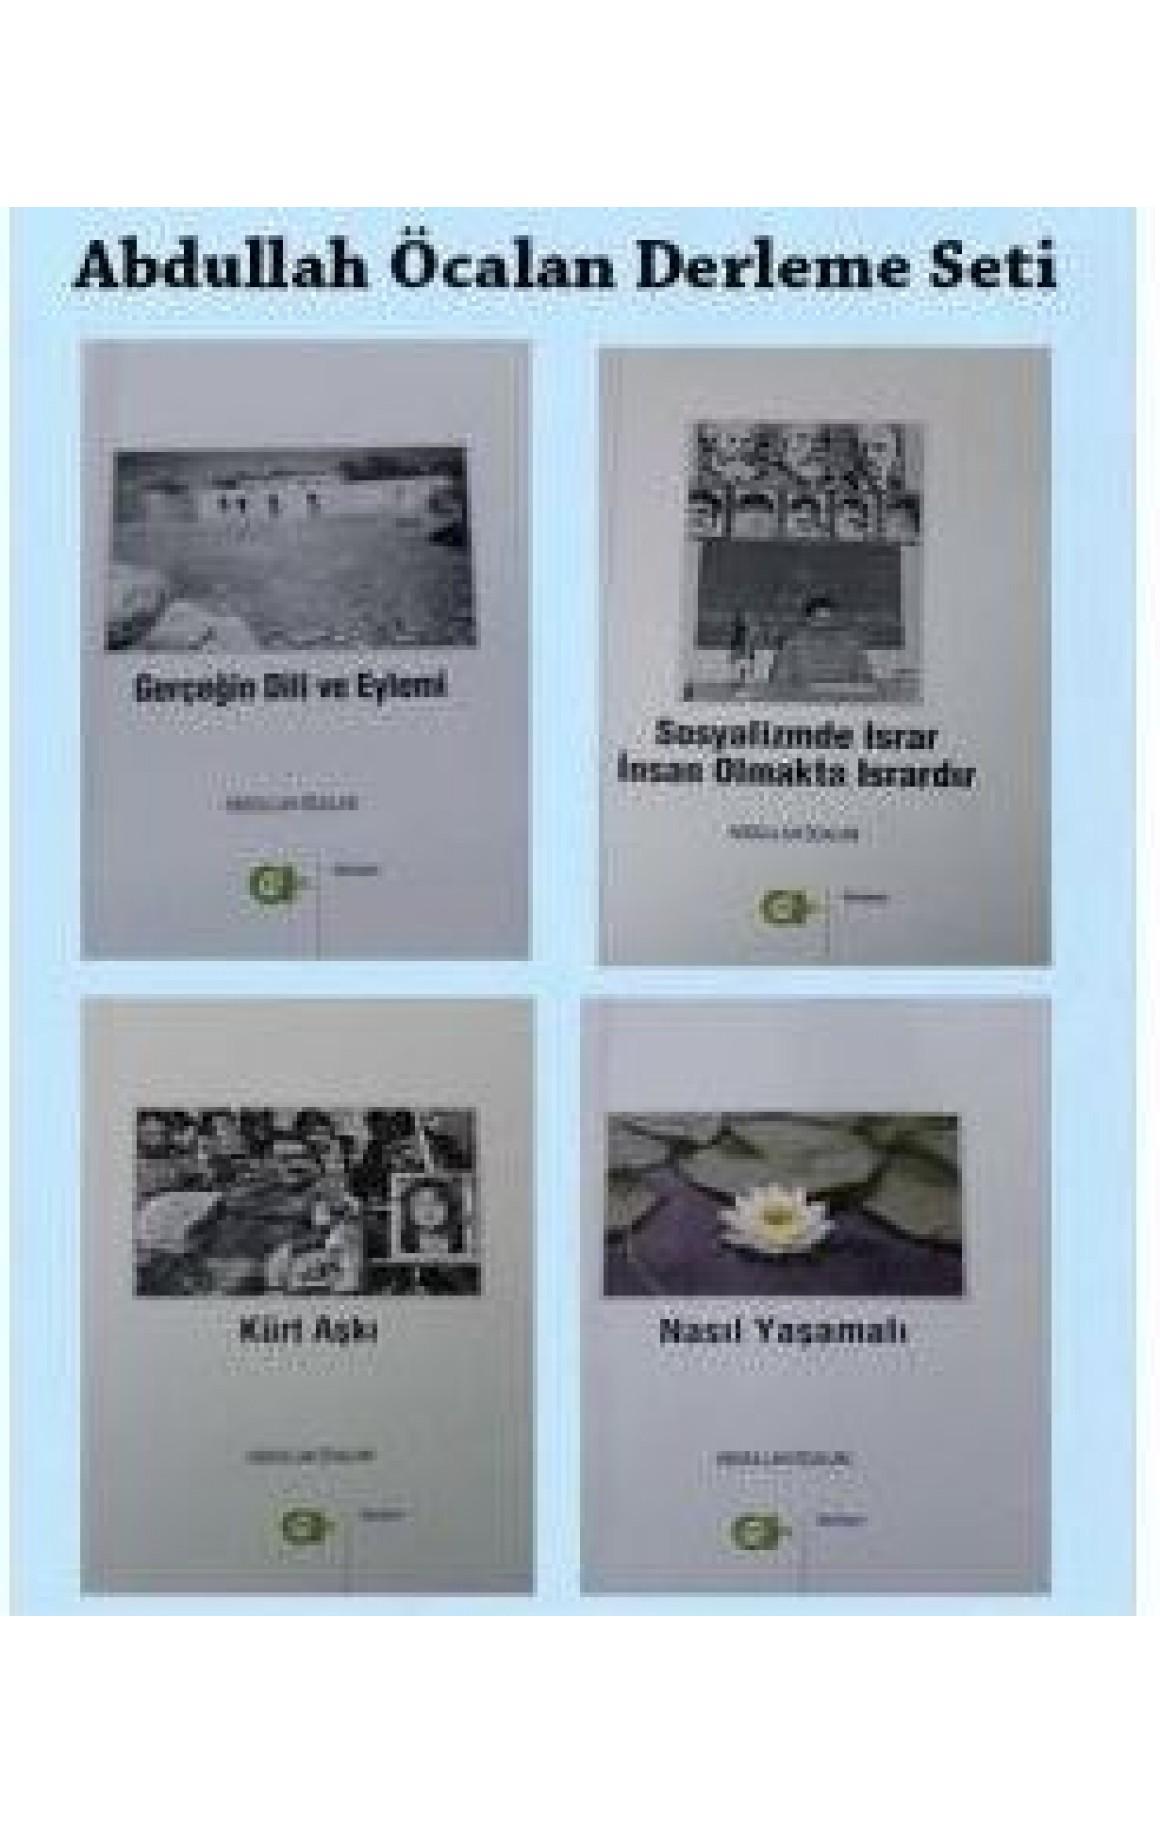 Abdullah Öcalan Derleme Seti